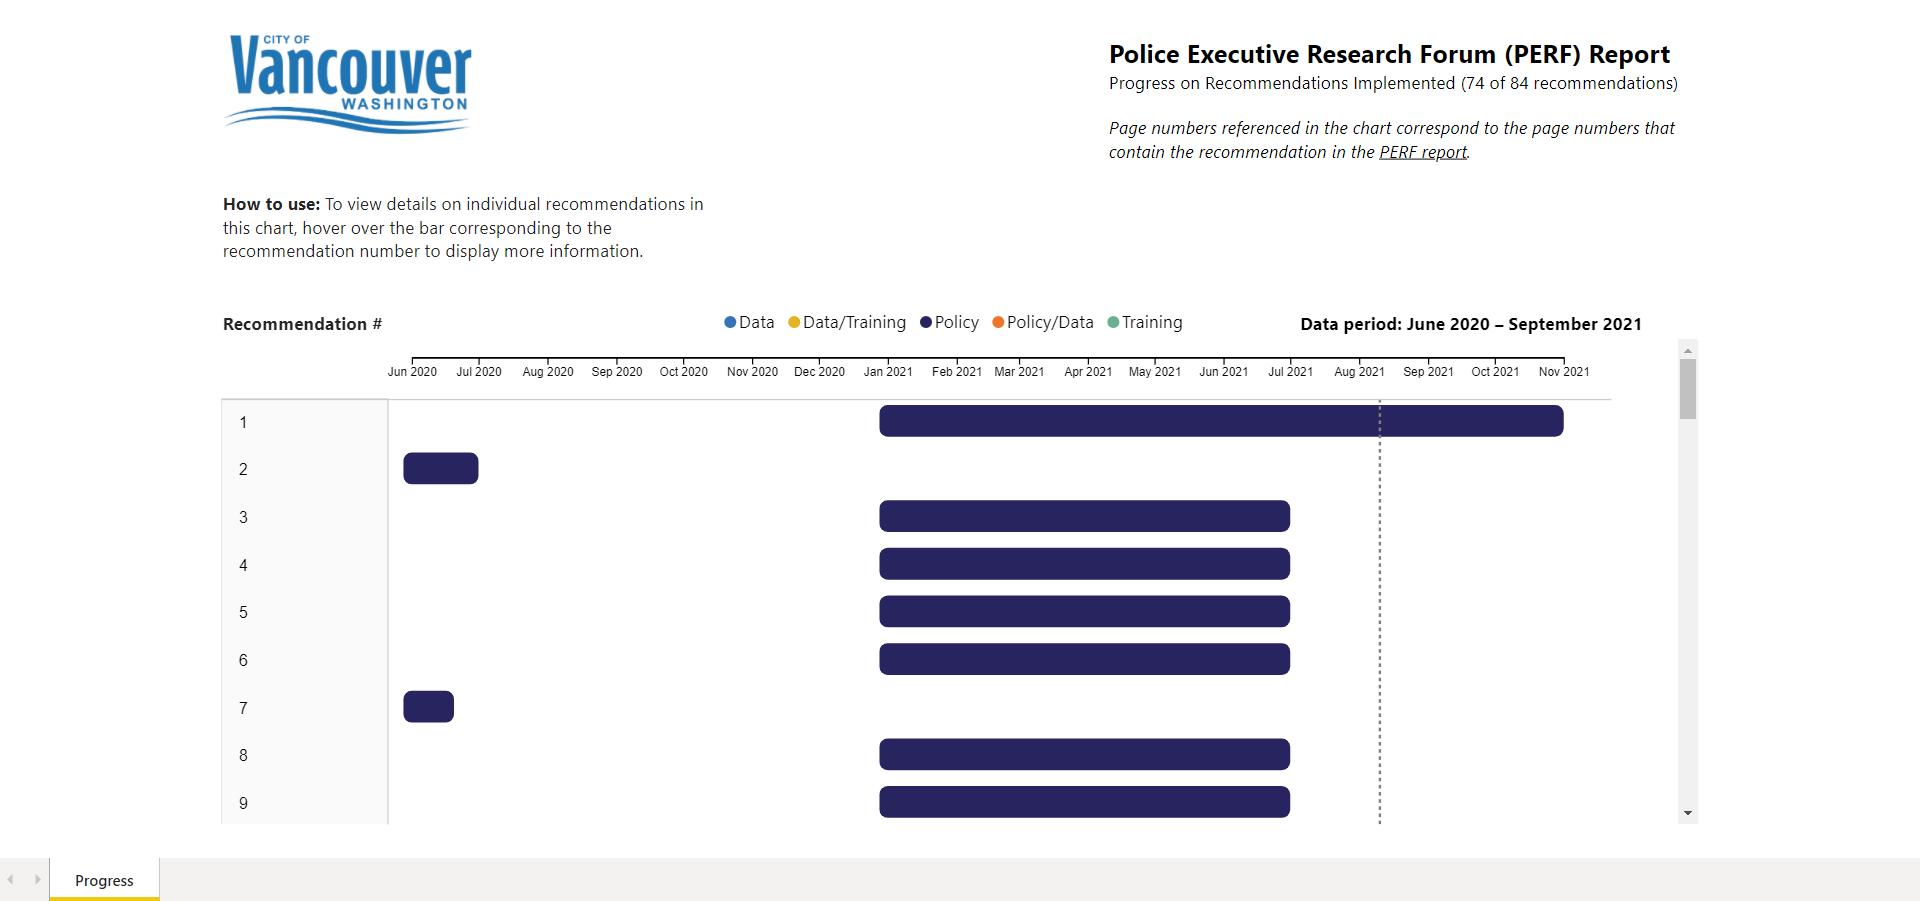 PERF Report progress chart